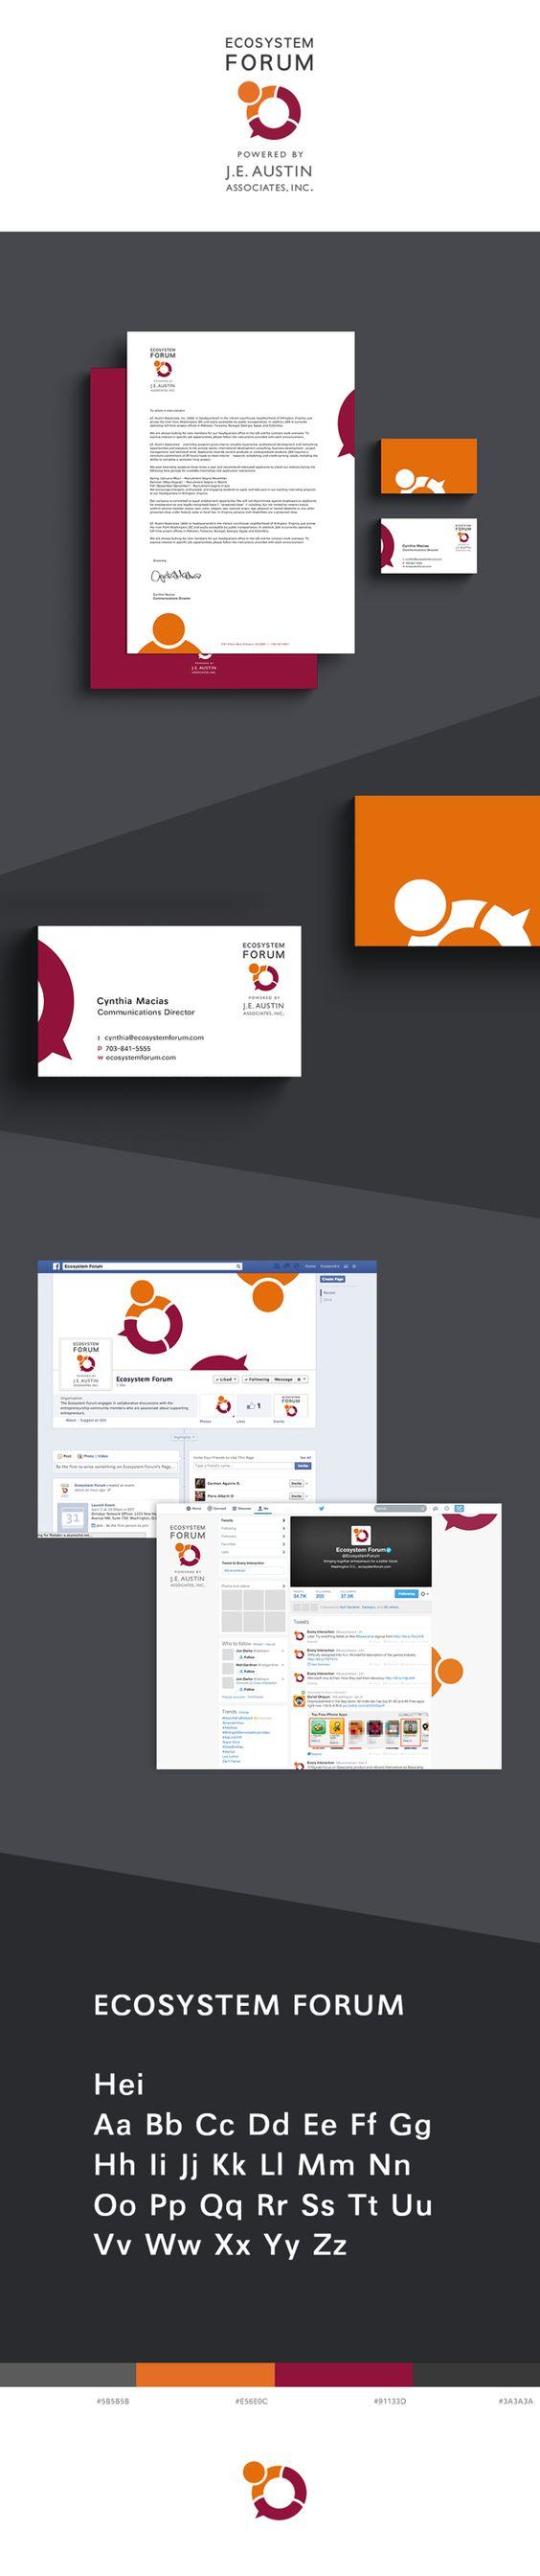 Ecosystem Forum Branding by Kassandra Zuanich, via Behance